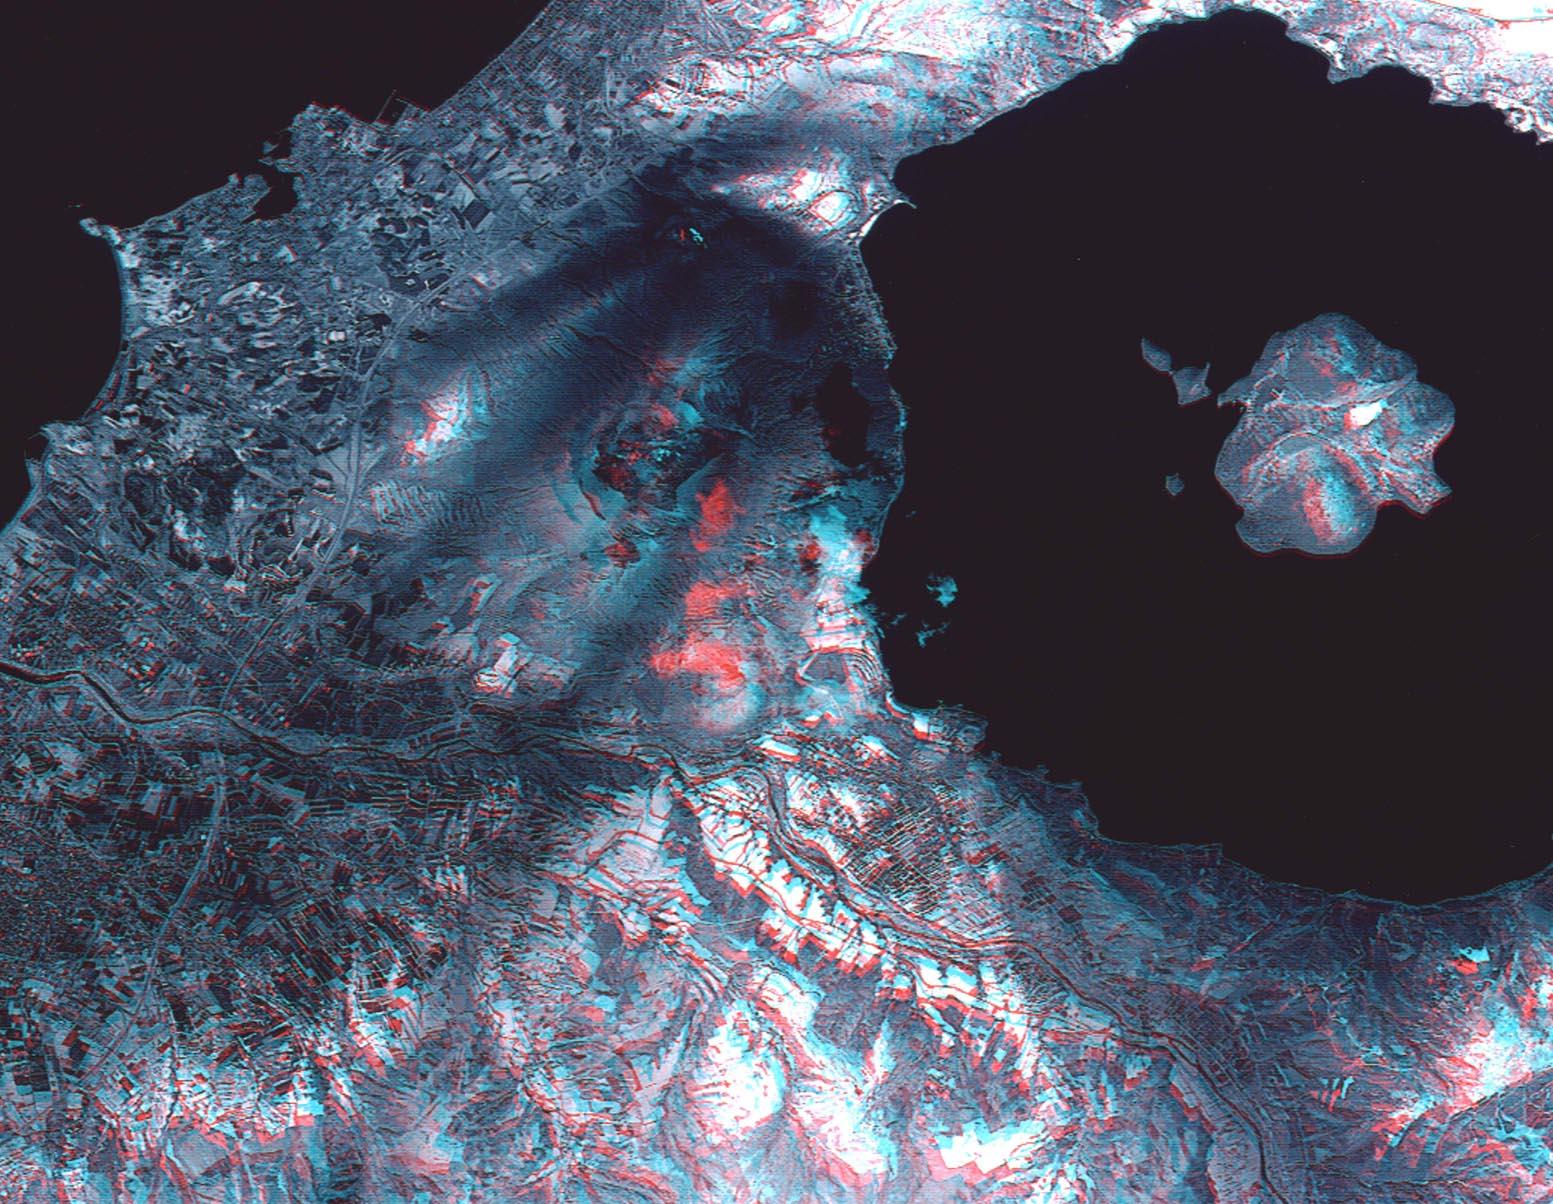 Volcán Usu